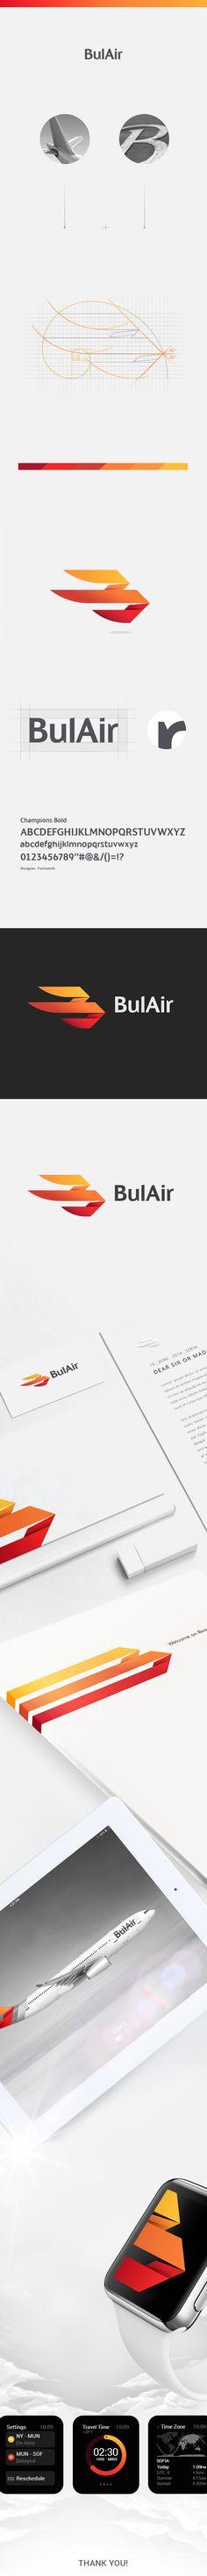 BulAir on Behance - www.maurosalfo.it - immobiliare@maurosalfo.it +39.339.78.54.440